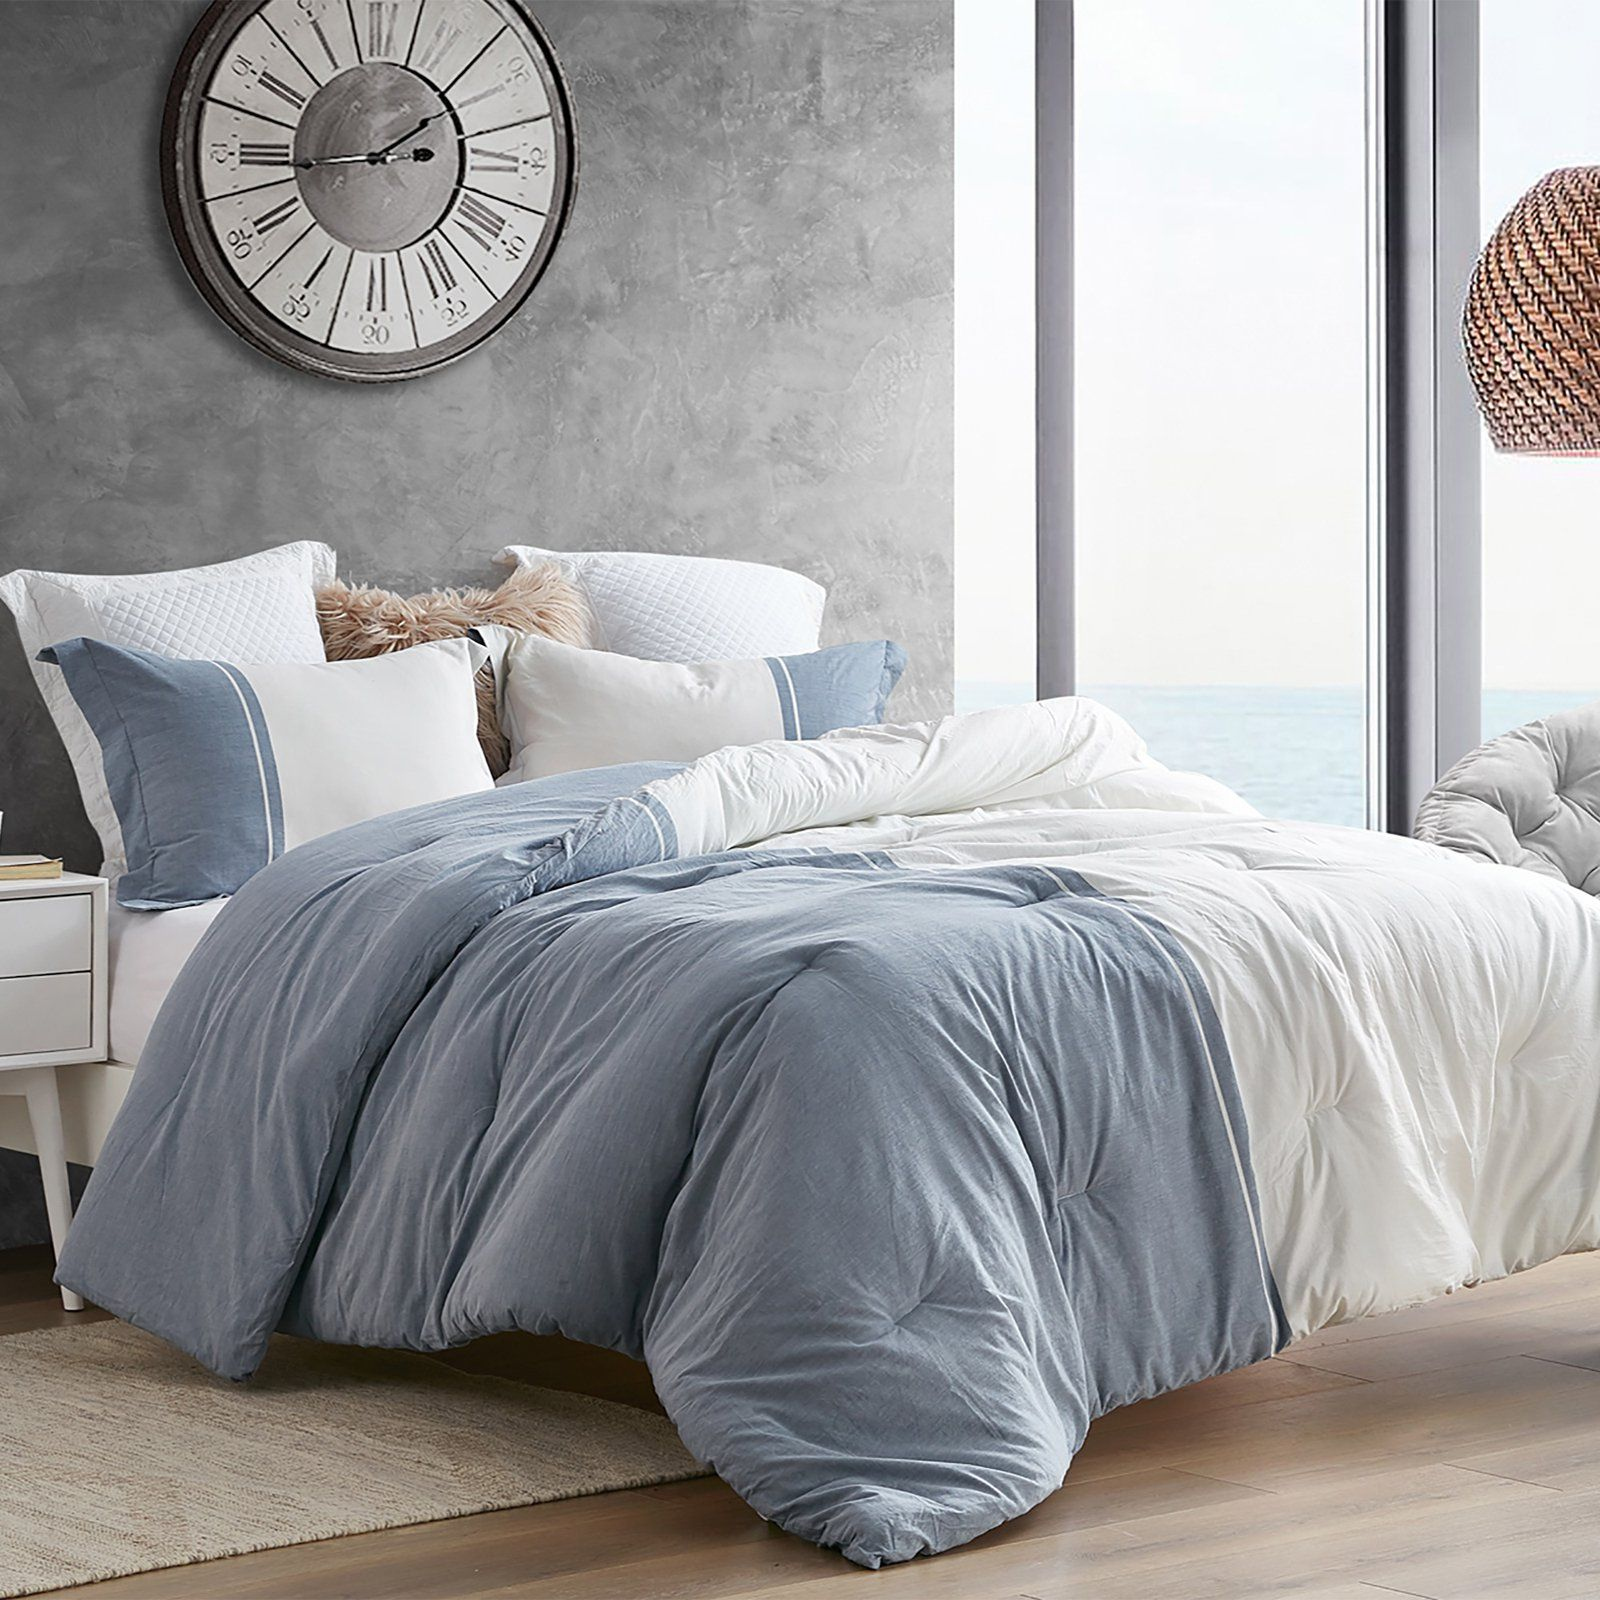 Half Moon Yarn Dyed Comforter by Byourbed Desert / Cream